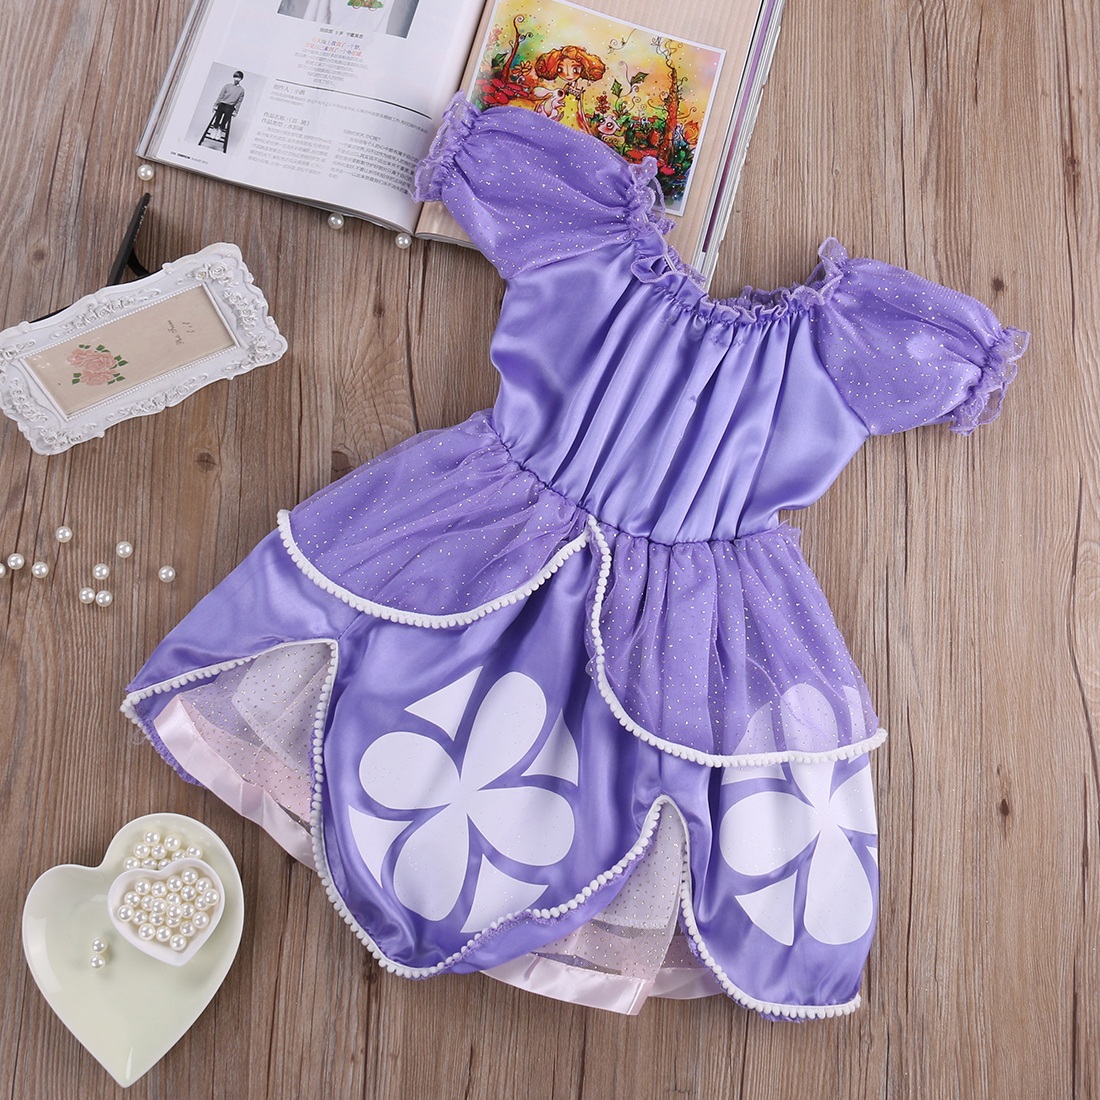 2016 Fancy Dress Baby Girls Kids Clothes Cartoon Sofia Purple Pageant Princess Party Costume Dress